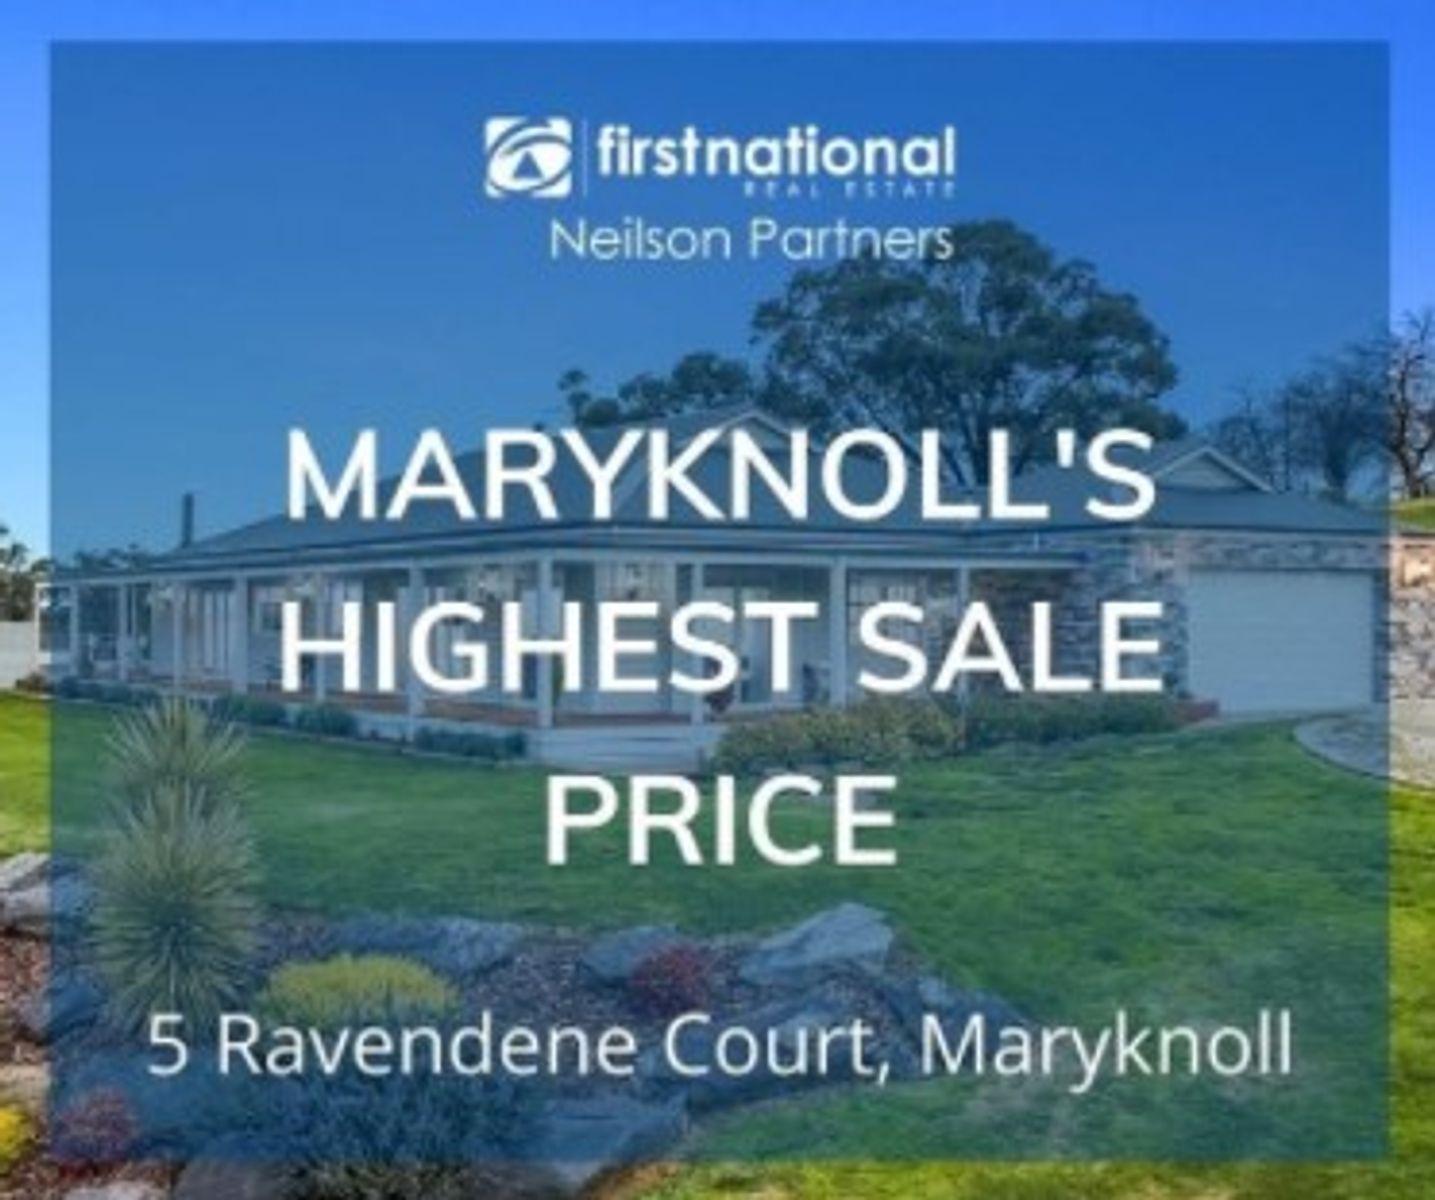 5 Ravendene Court, Maryknoll with wording overlay